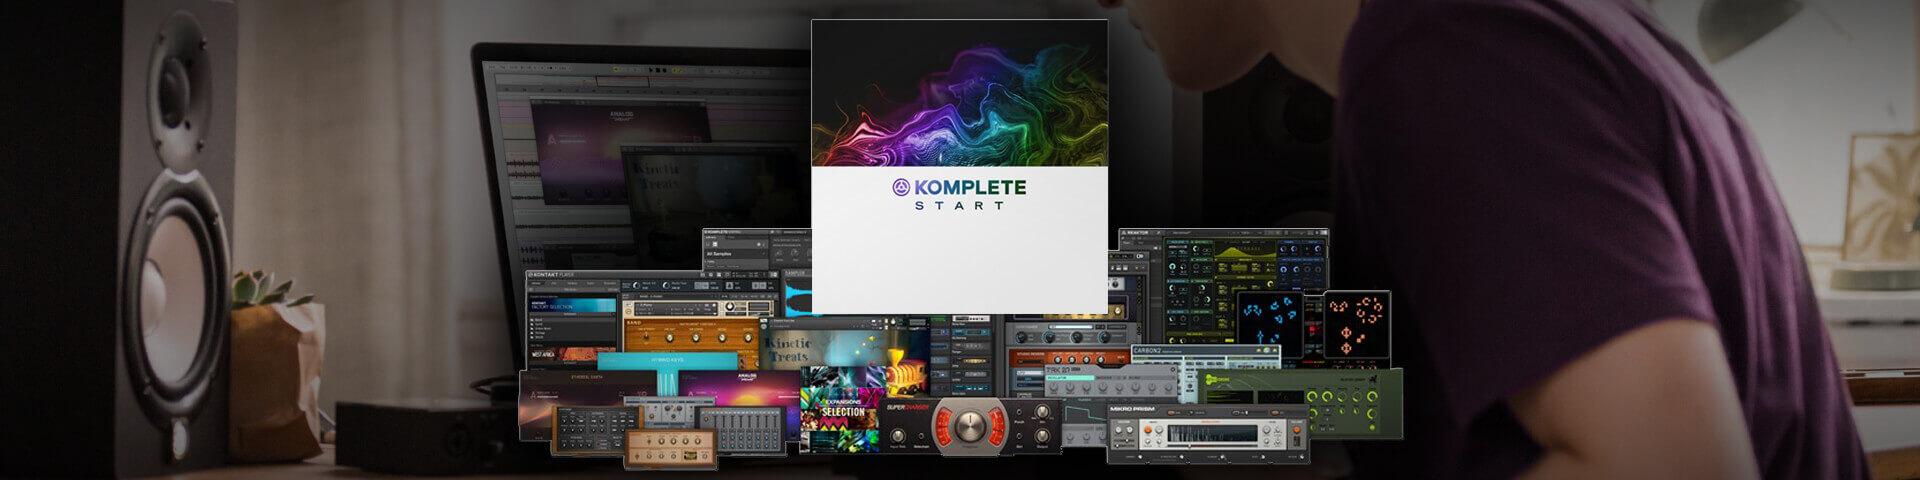 komplete software